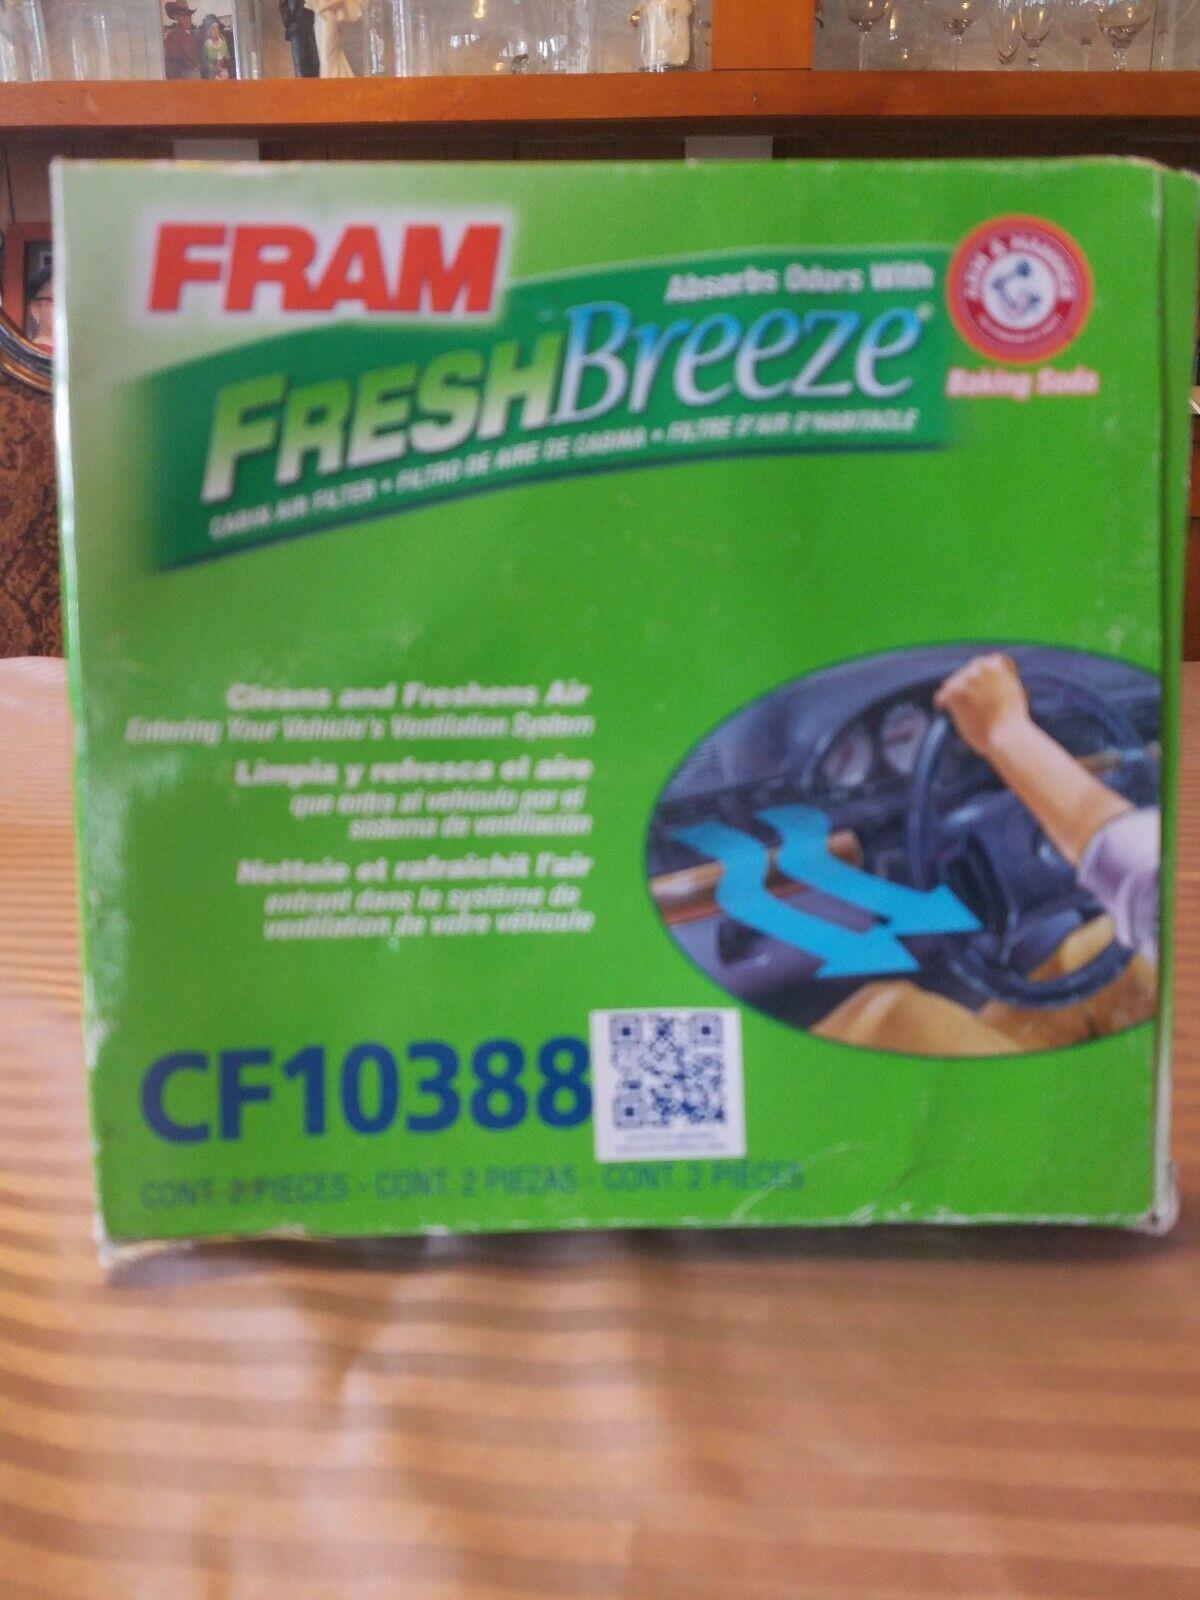 FRAM CF10388 Fresh Breeze Cabin Air Filter with Arm /& Hammer